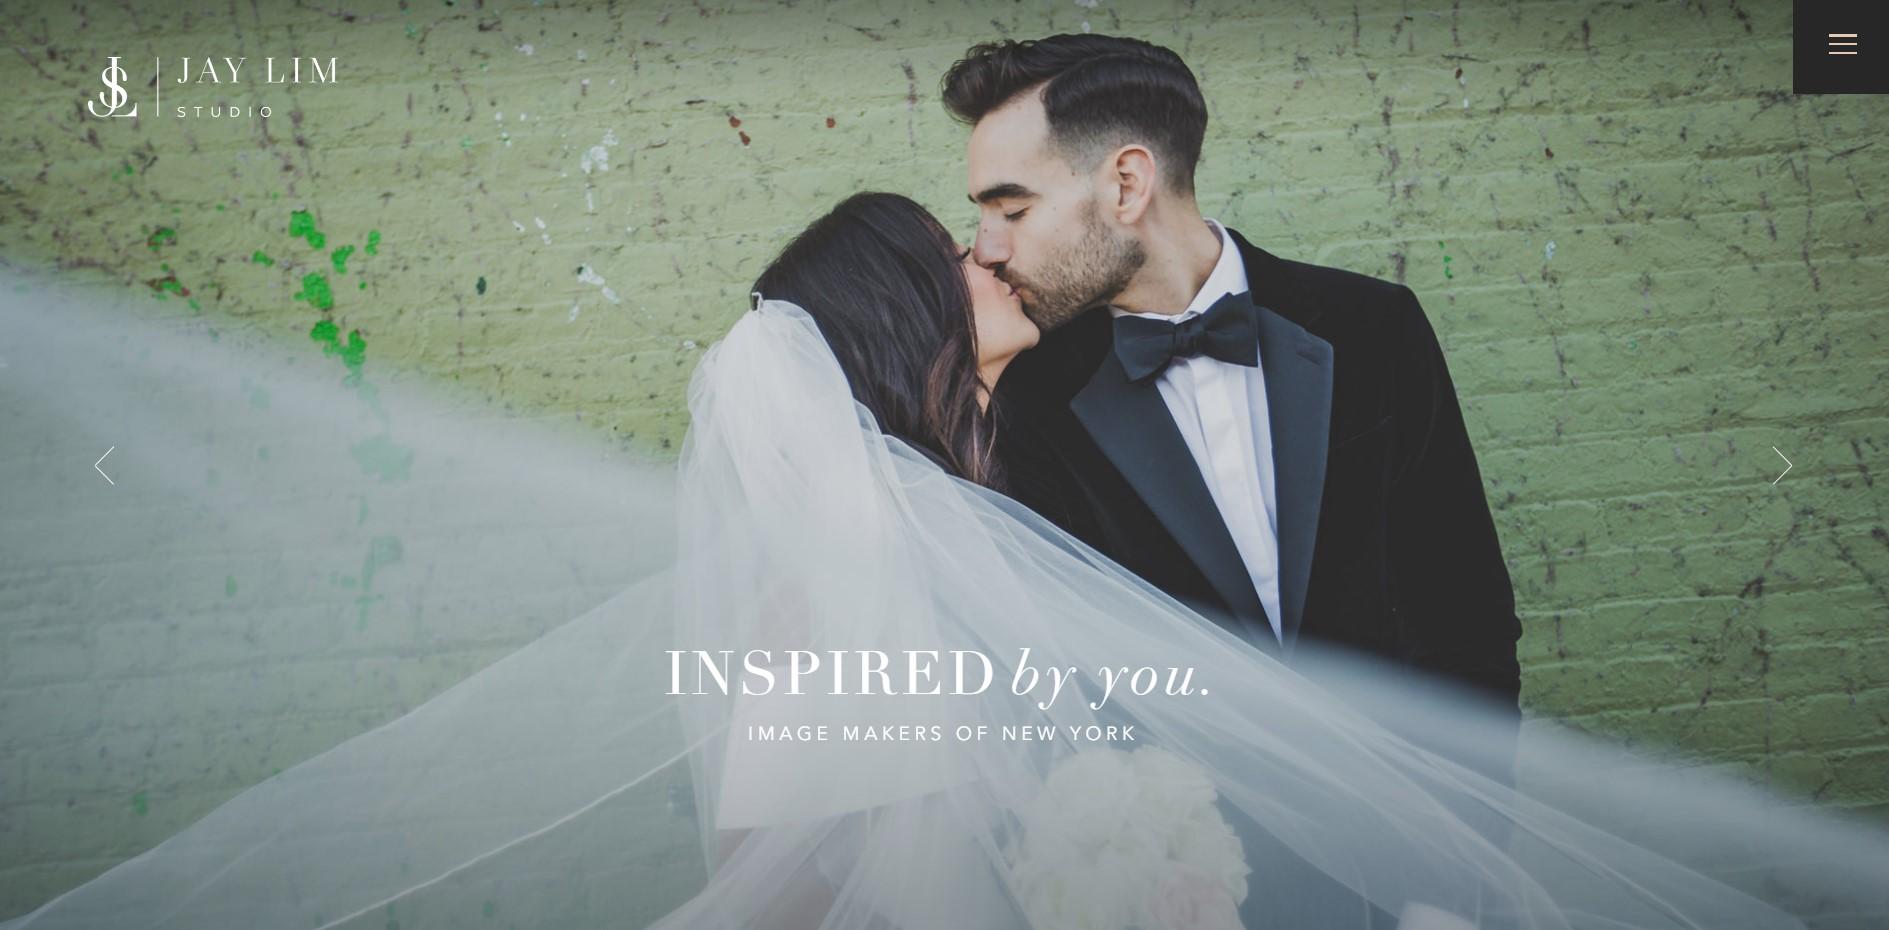 jay lim studio wedding photographer in new york